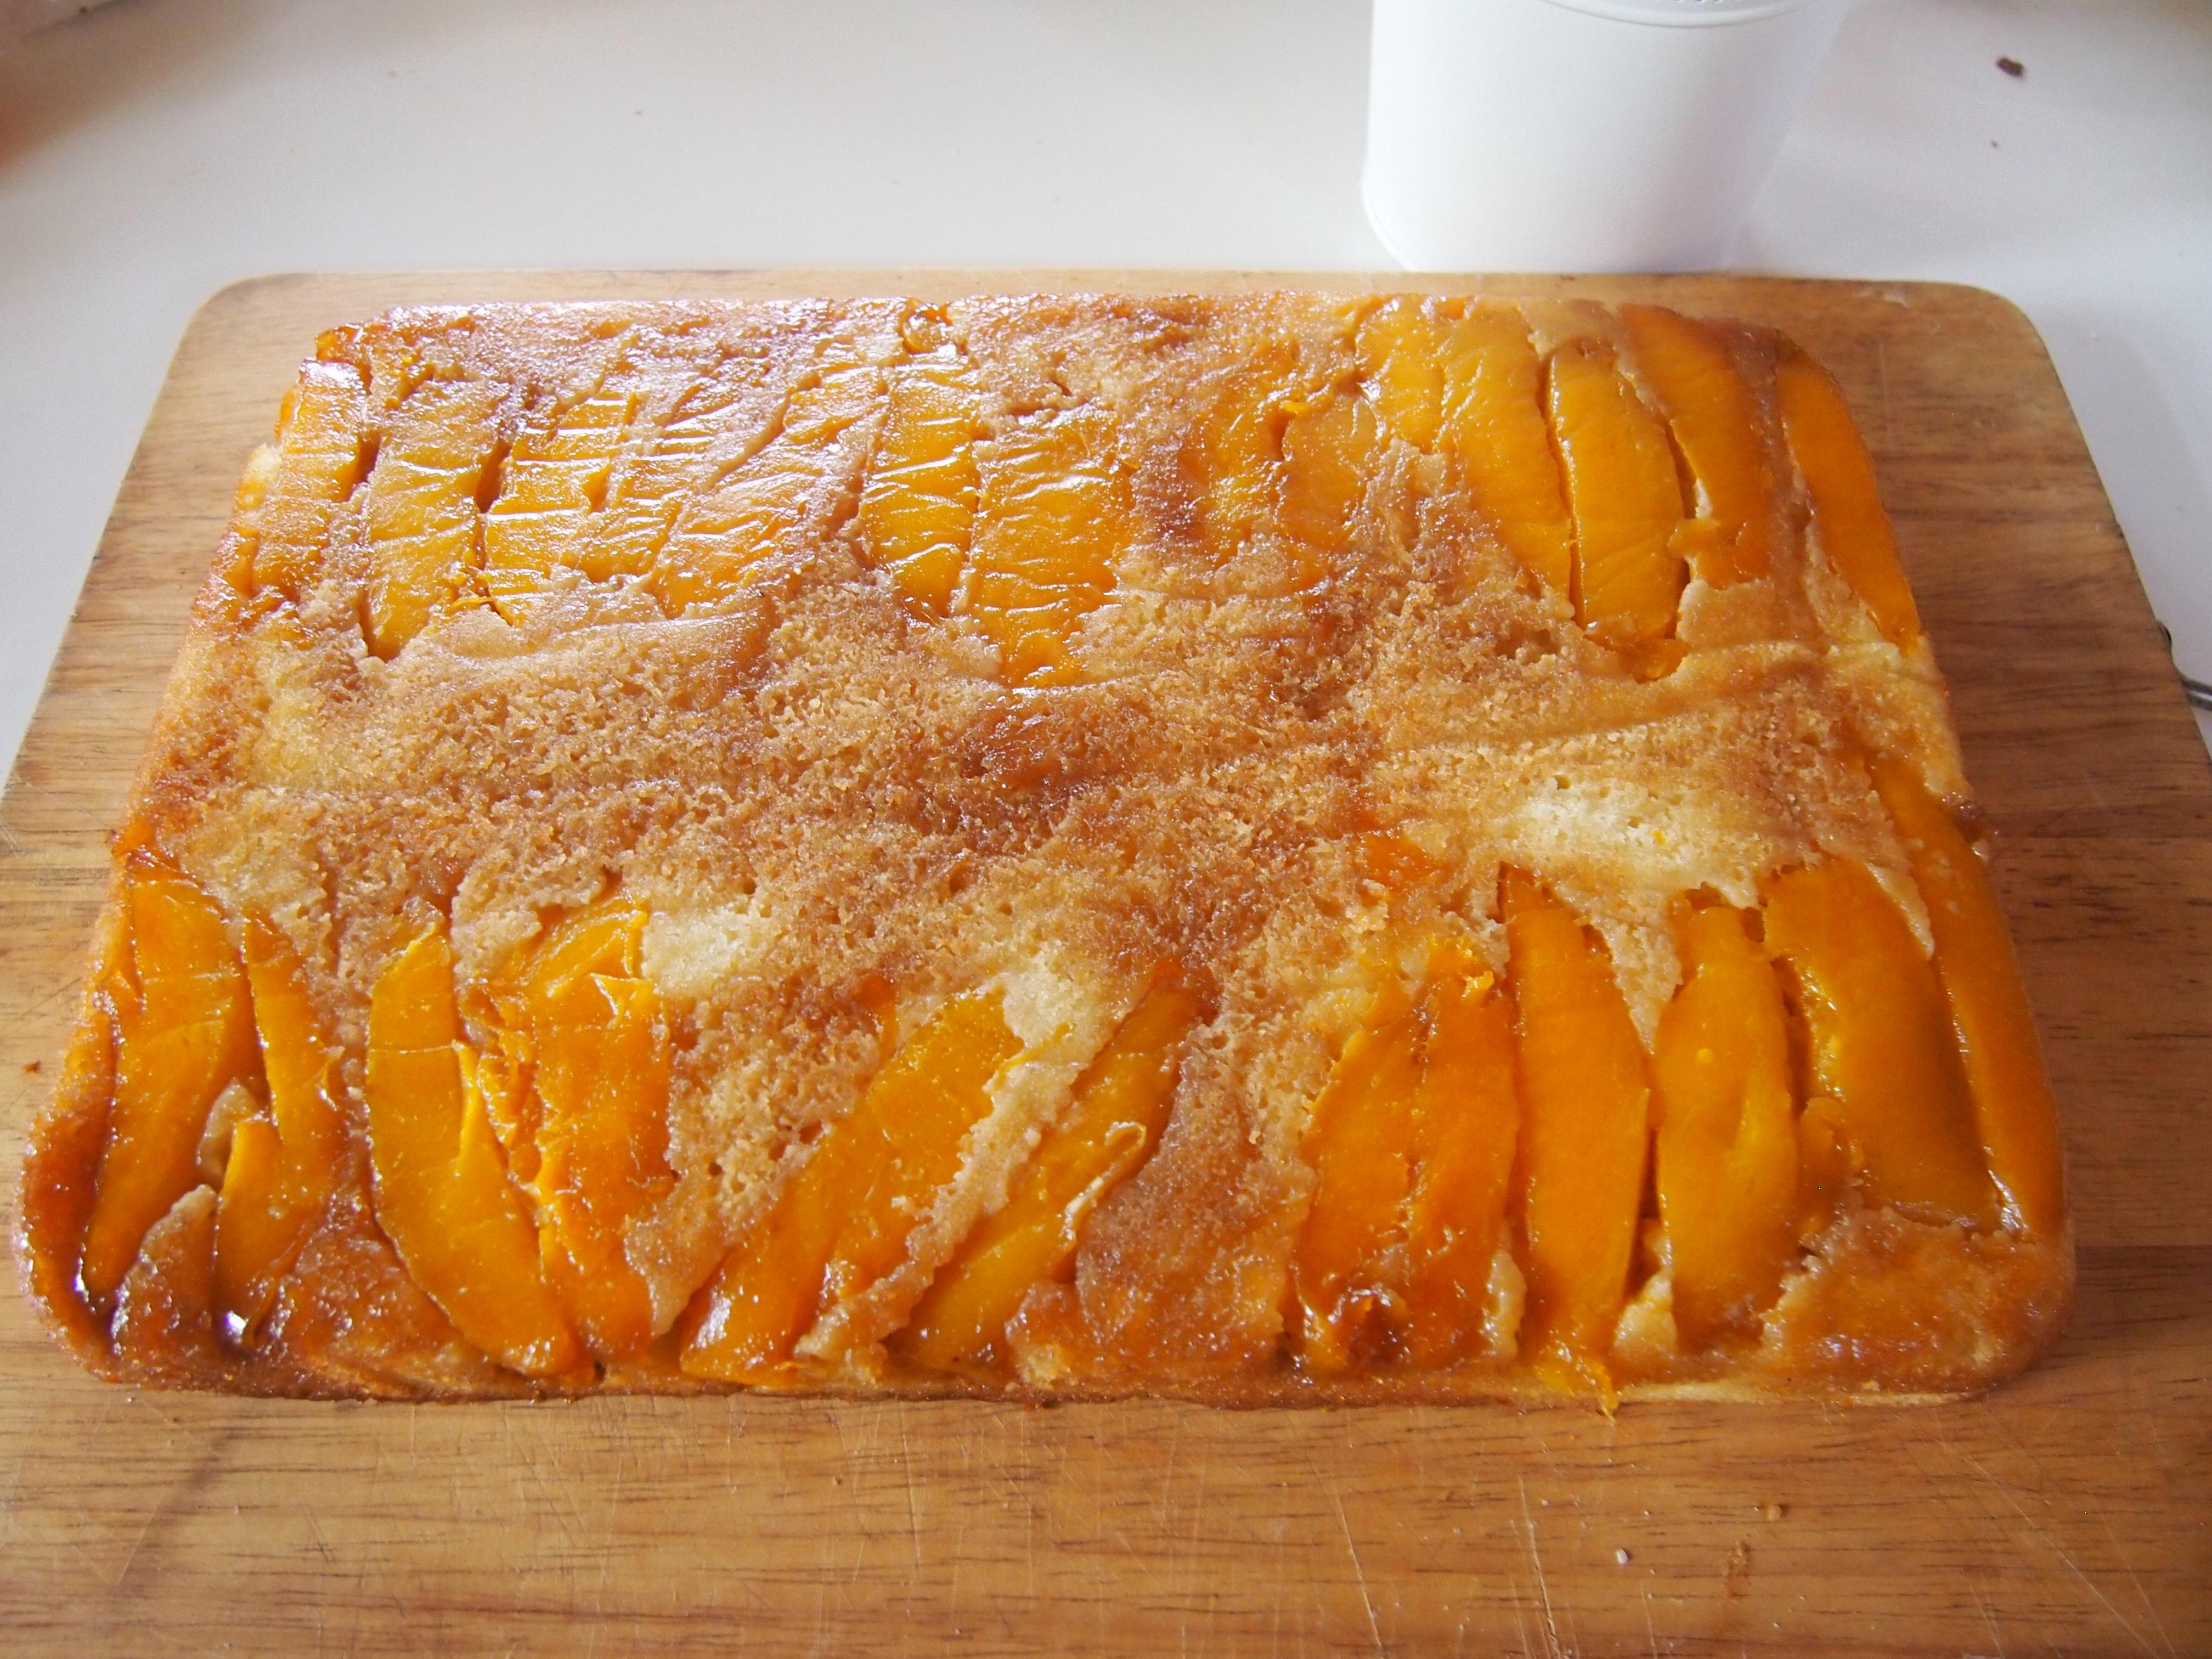 Upside down mango slab cake emerges from it's tin.